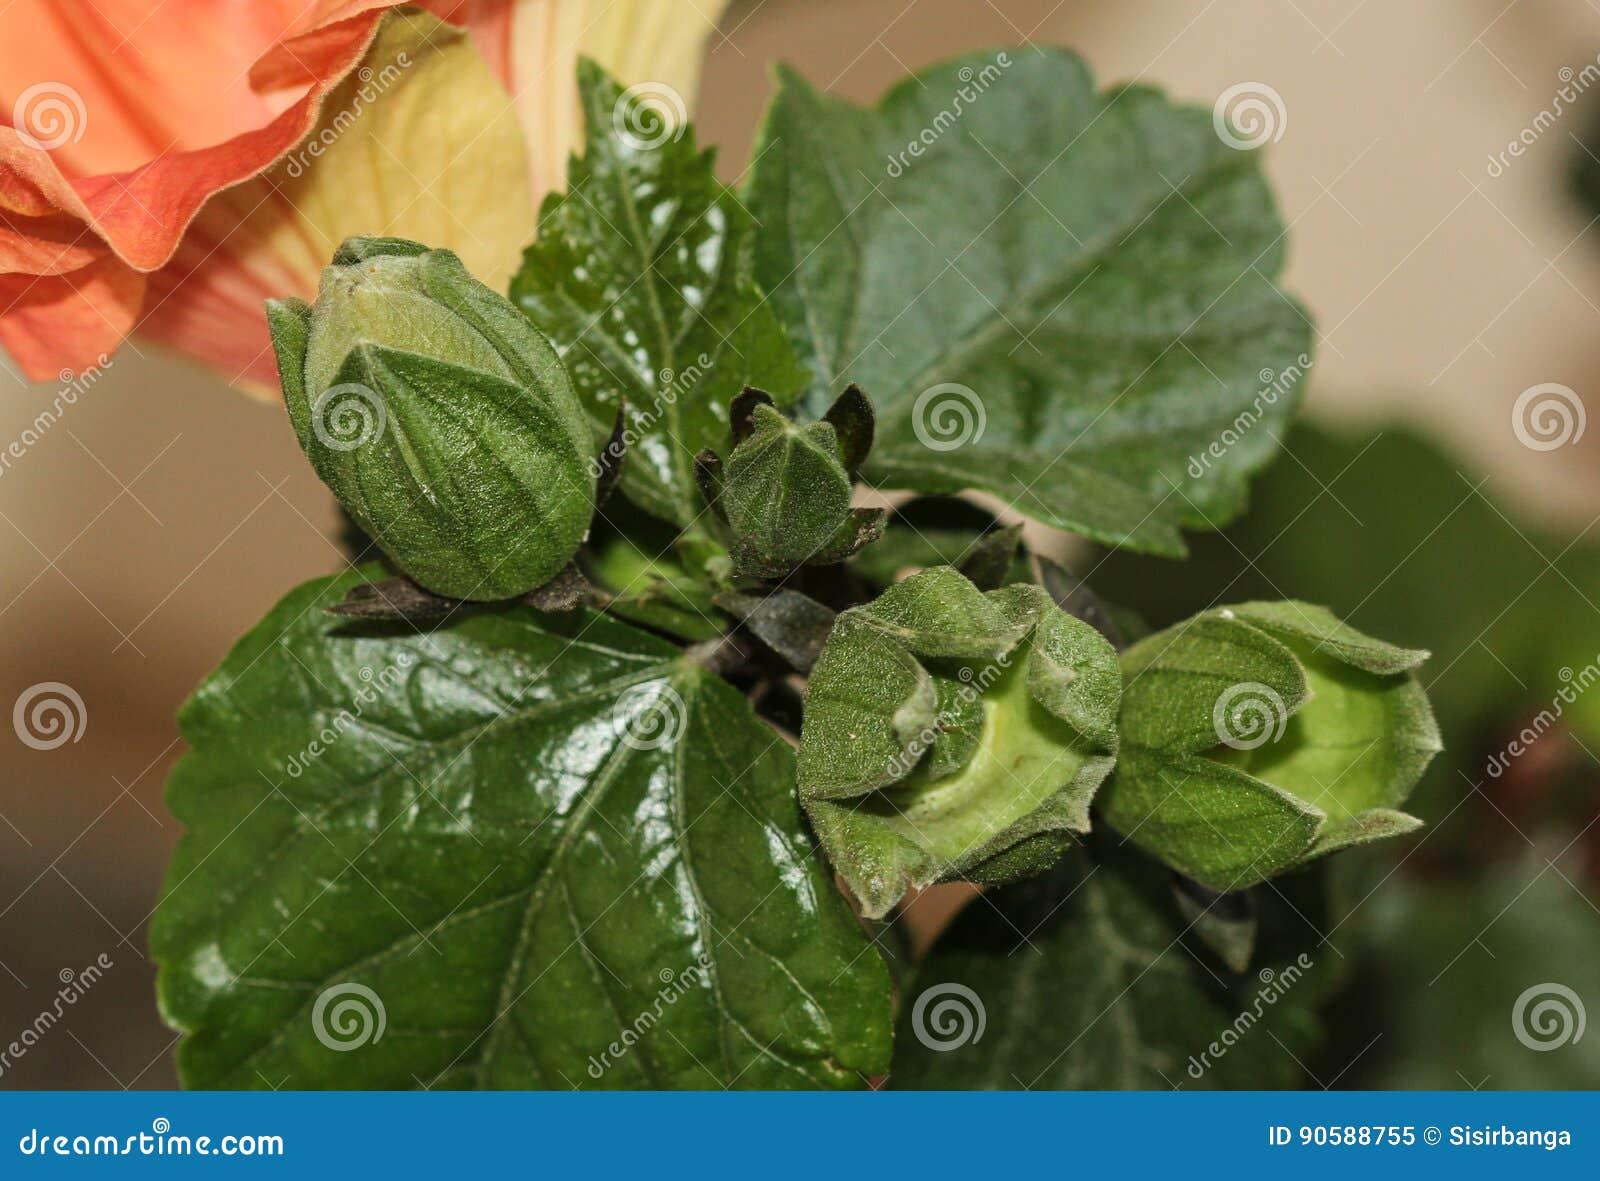 Hibiscus Bud And Calyx Stock Image Image Of Autumn Calyx 90588755